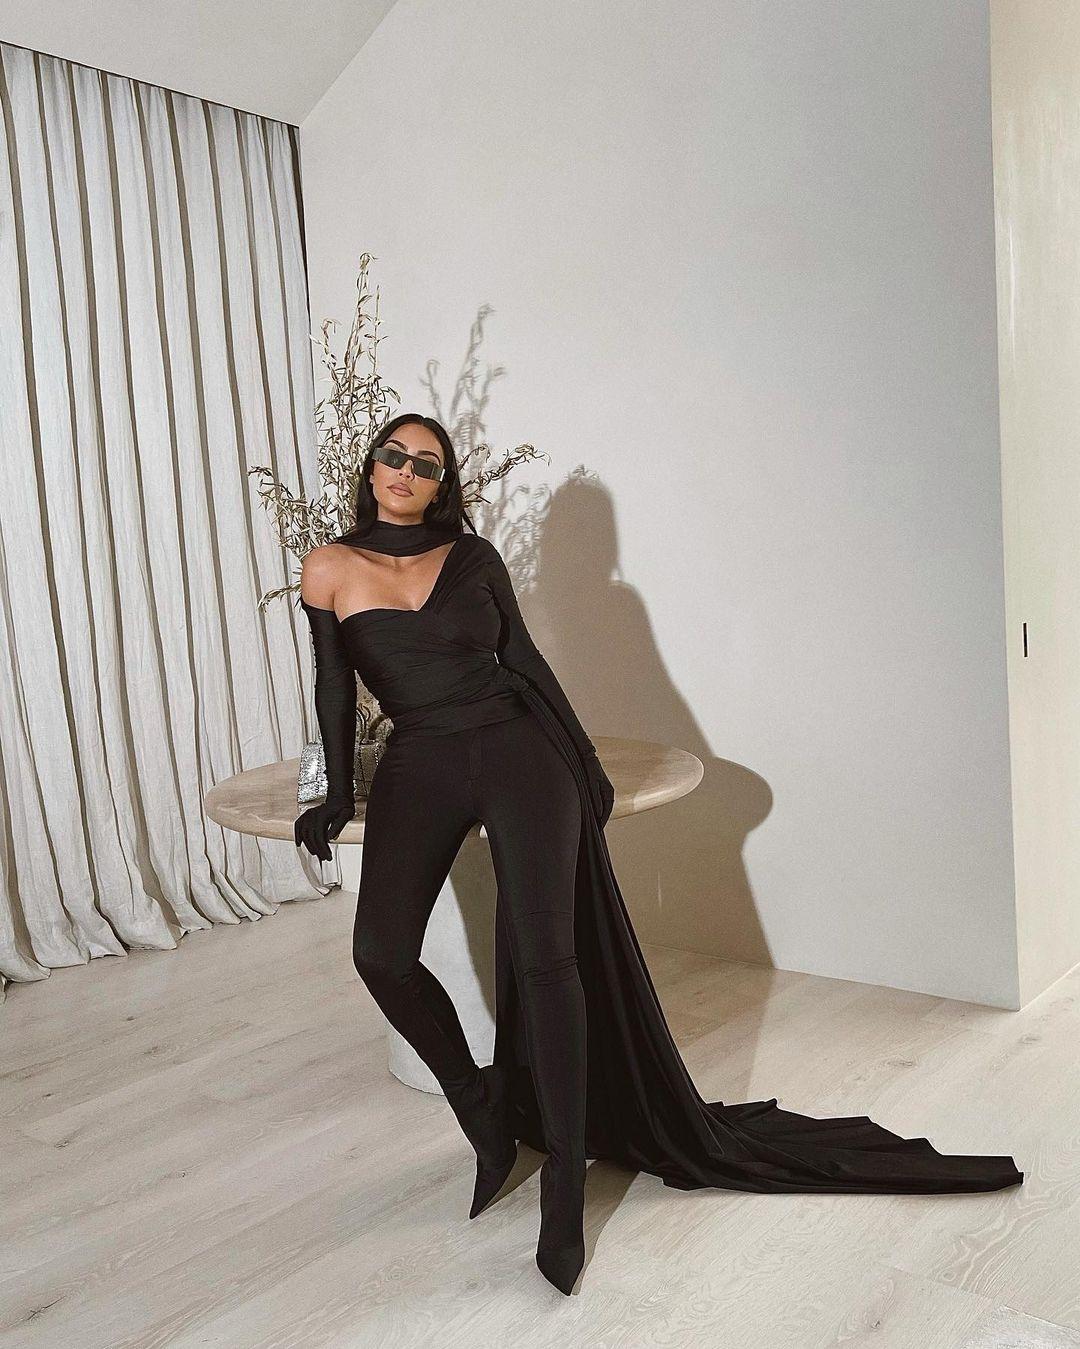 Kim Kardashian is In The Matrix! - Photo 1